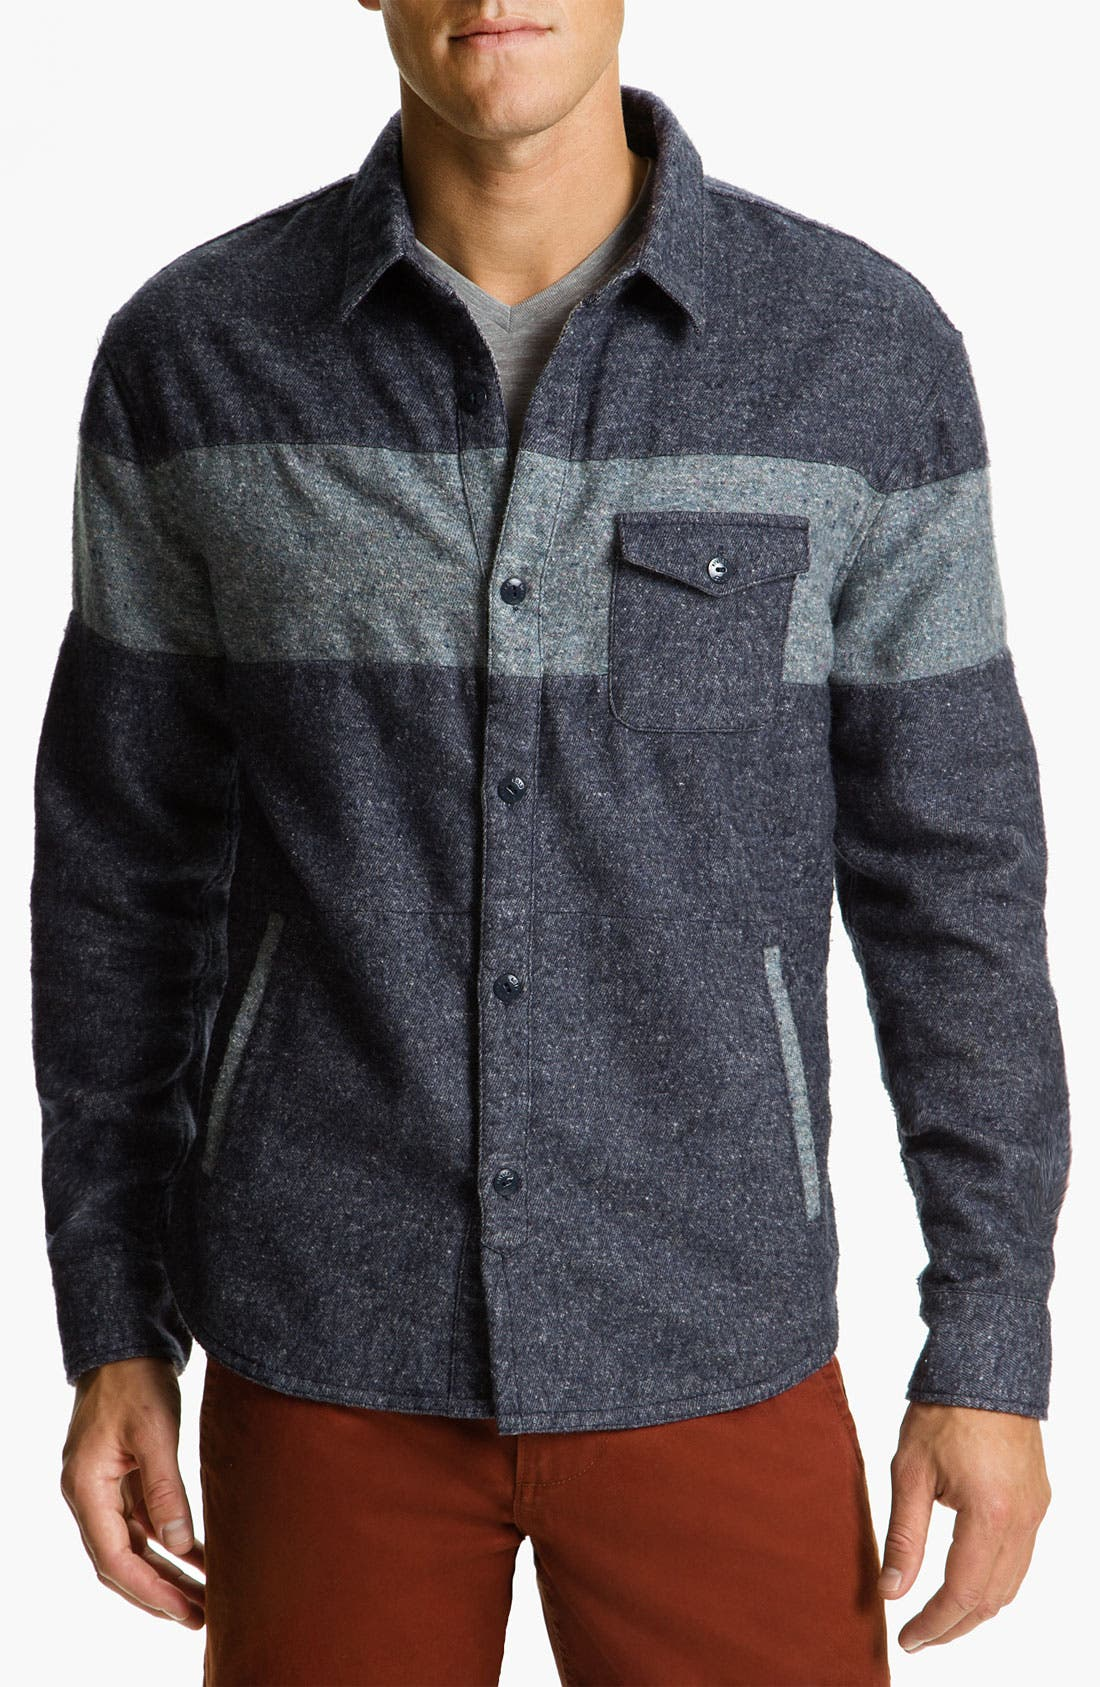 Alternate Image 1 Selected - Riviera Club 'CPO' Woven Shirt Jacket